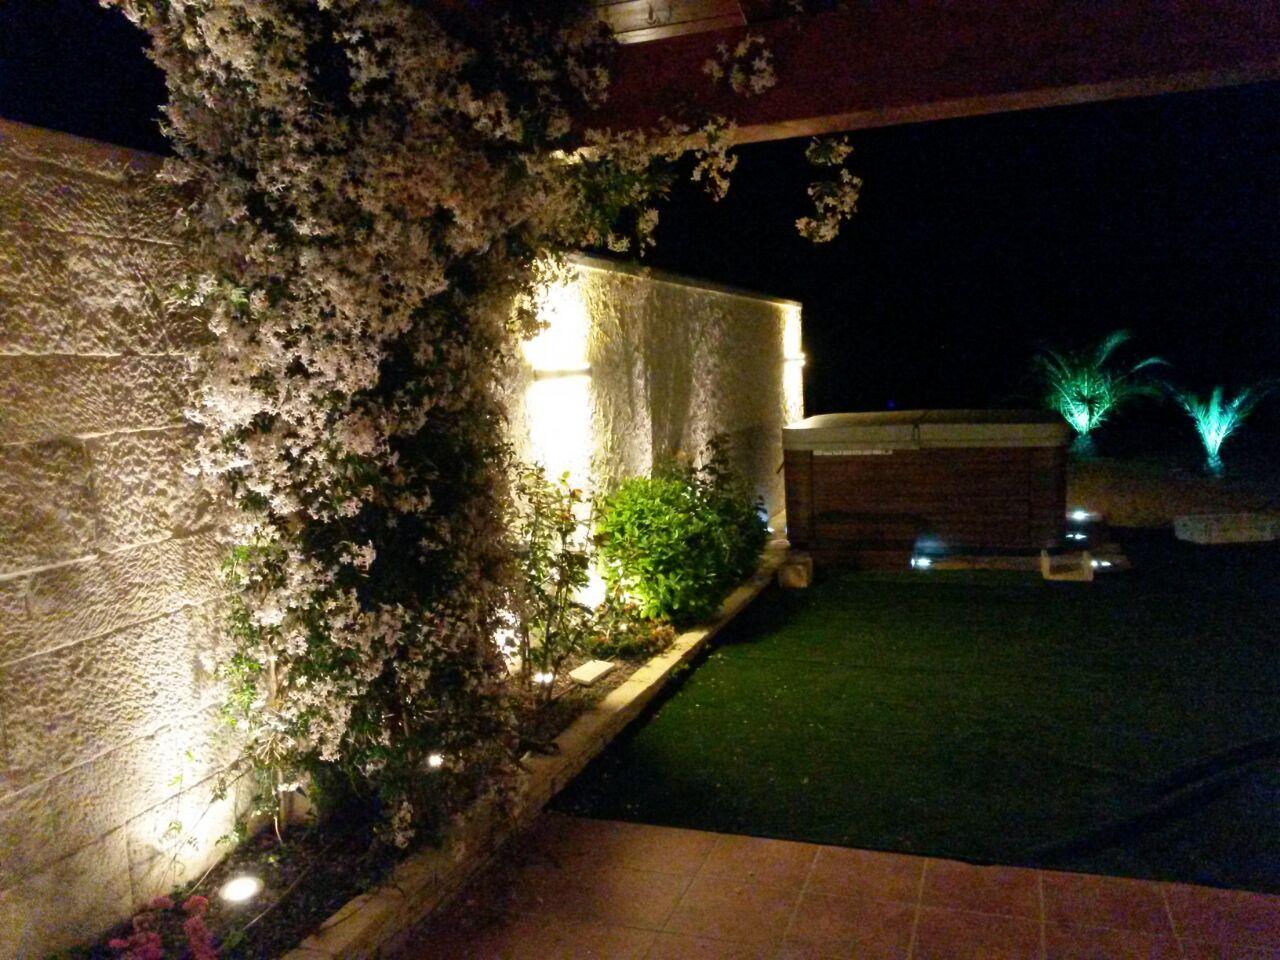 Iluminaci n insbar - Iluminacion de jardines modernos ...